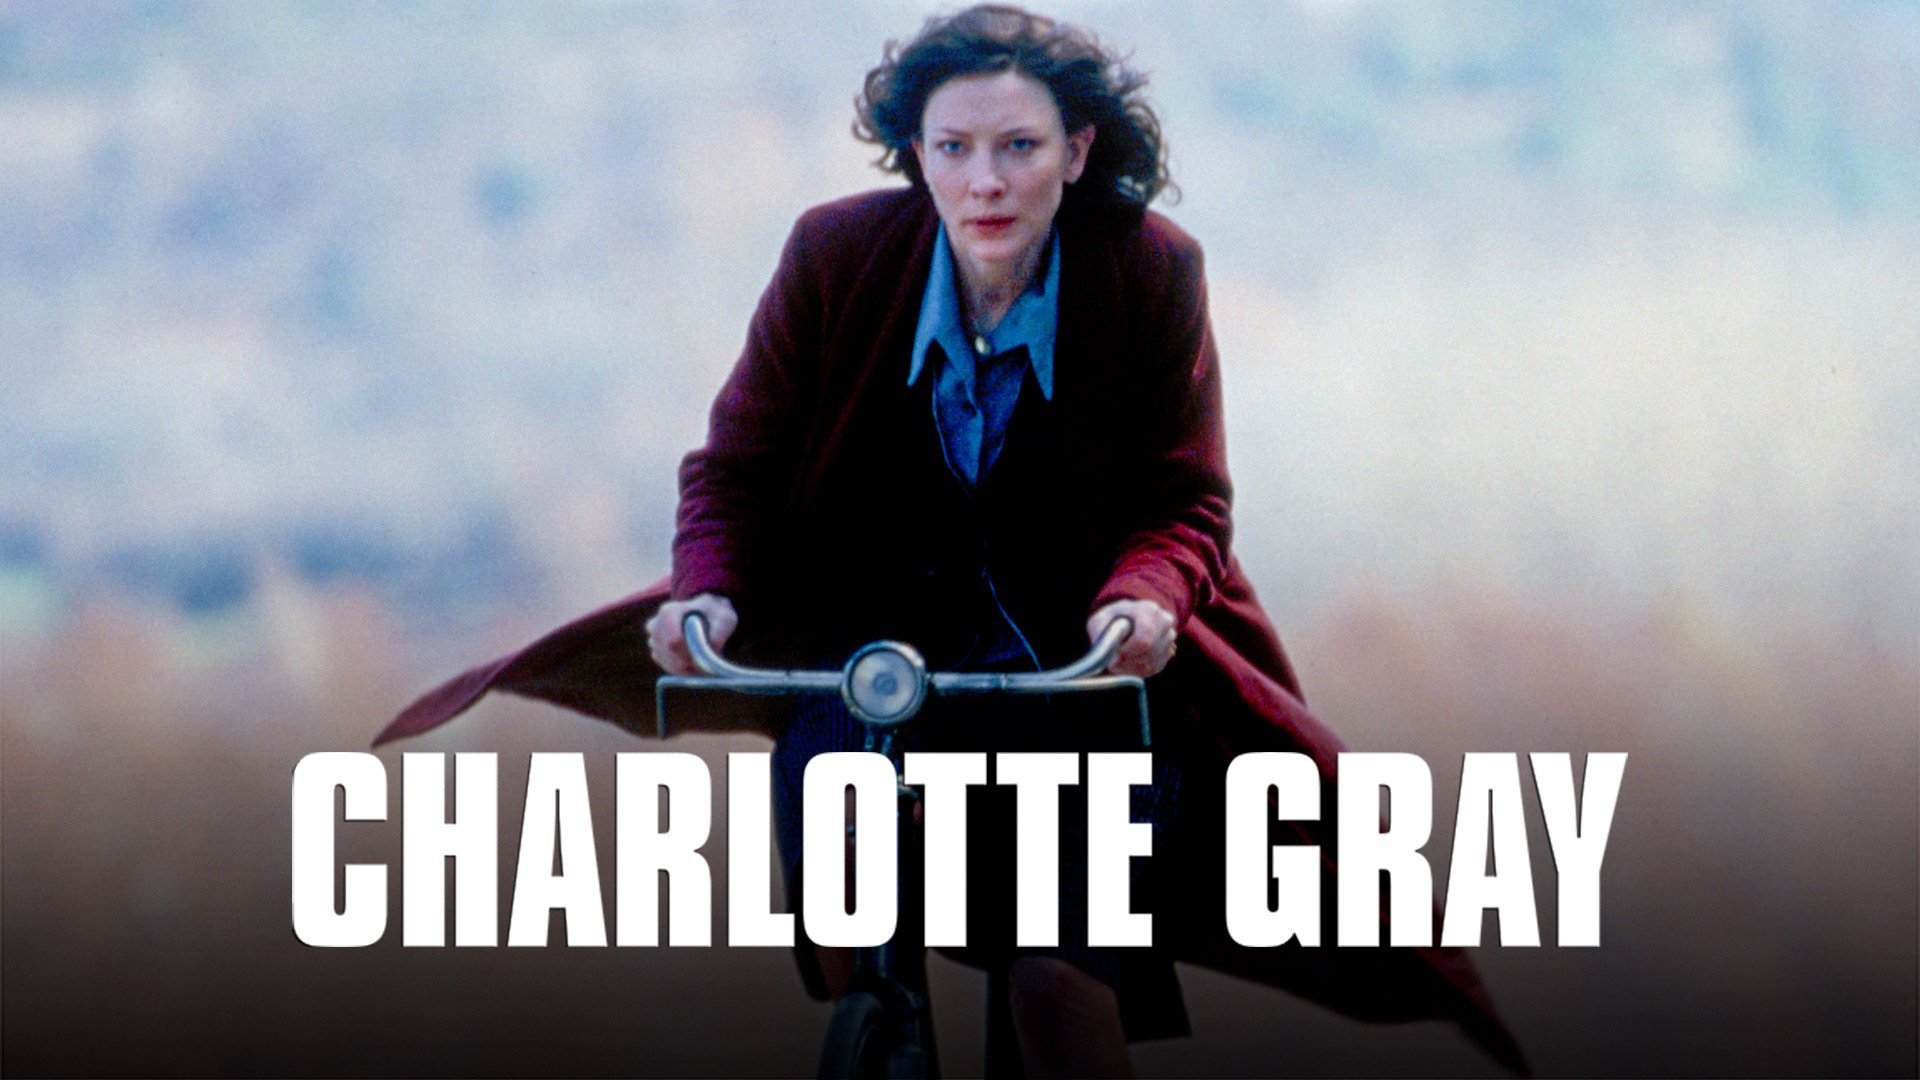 Charlotte Gray on BritBox UK